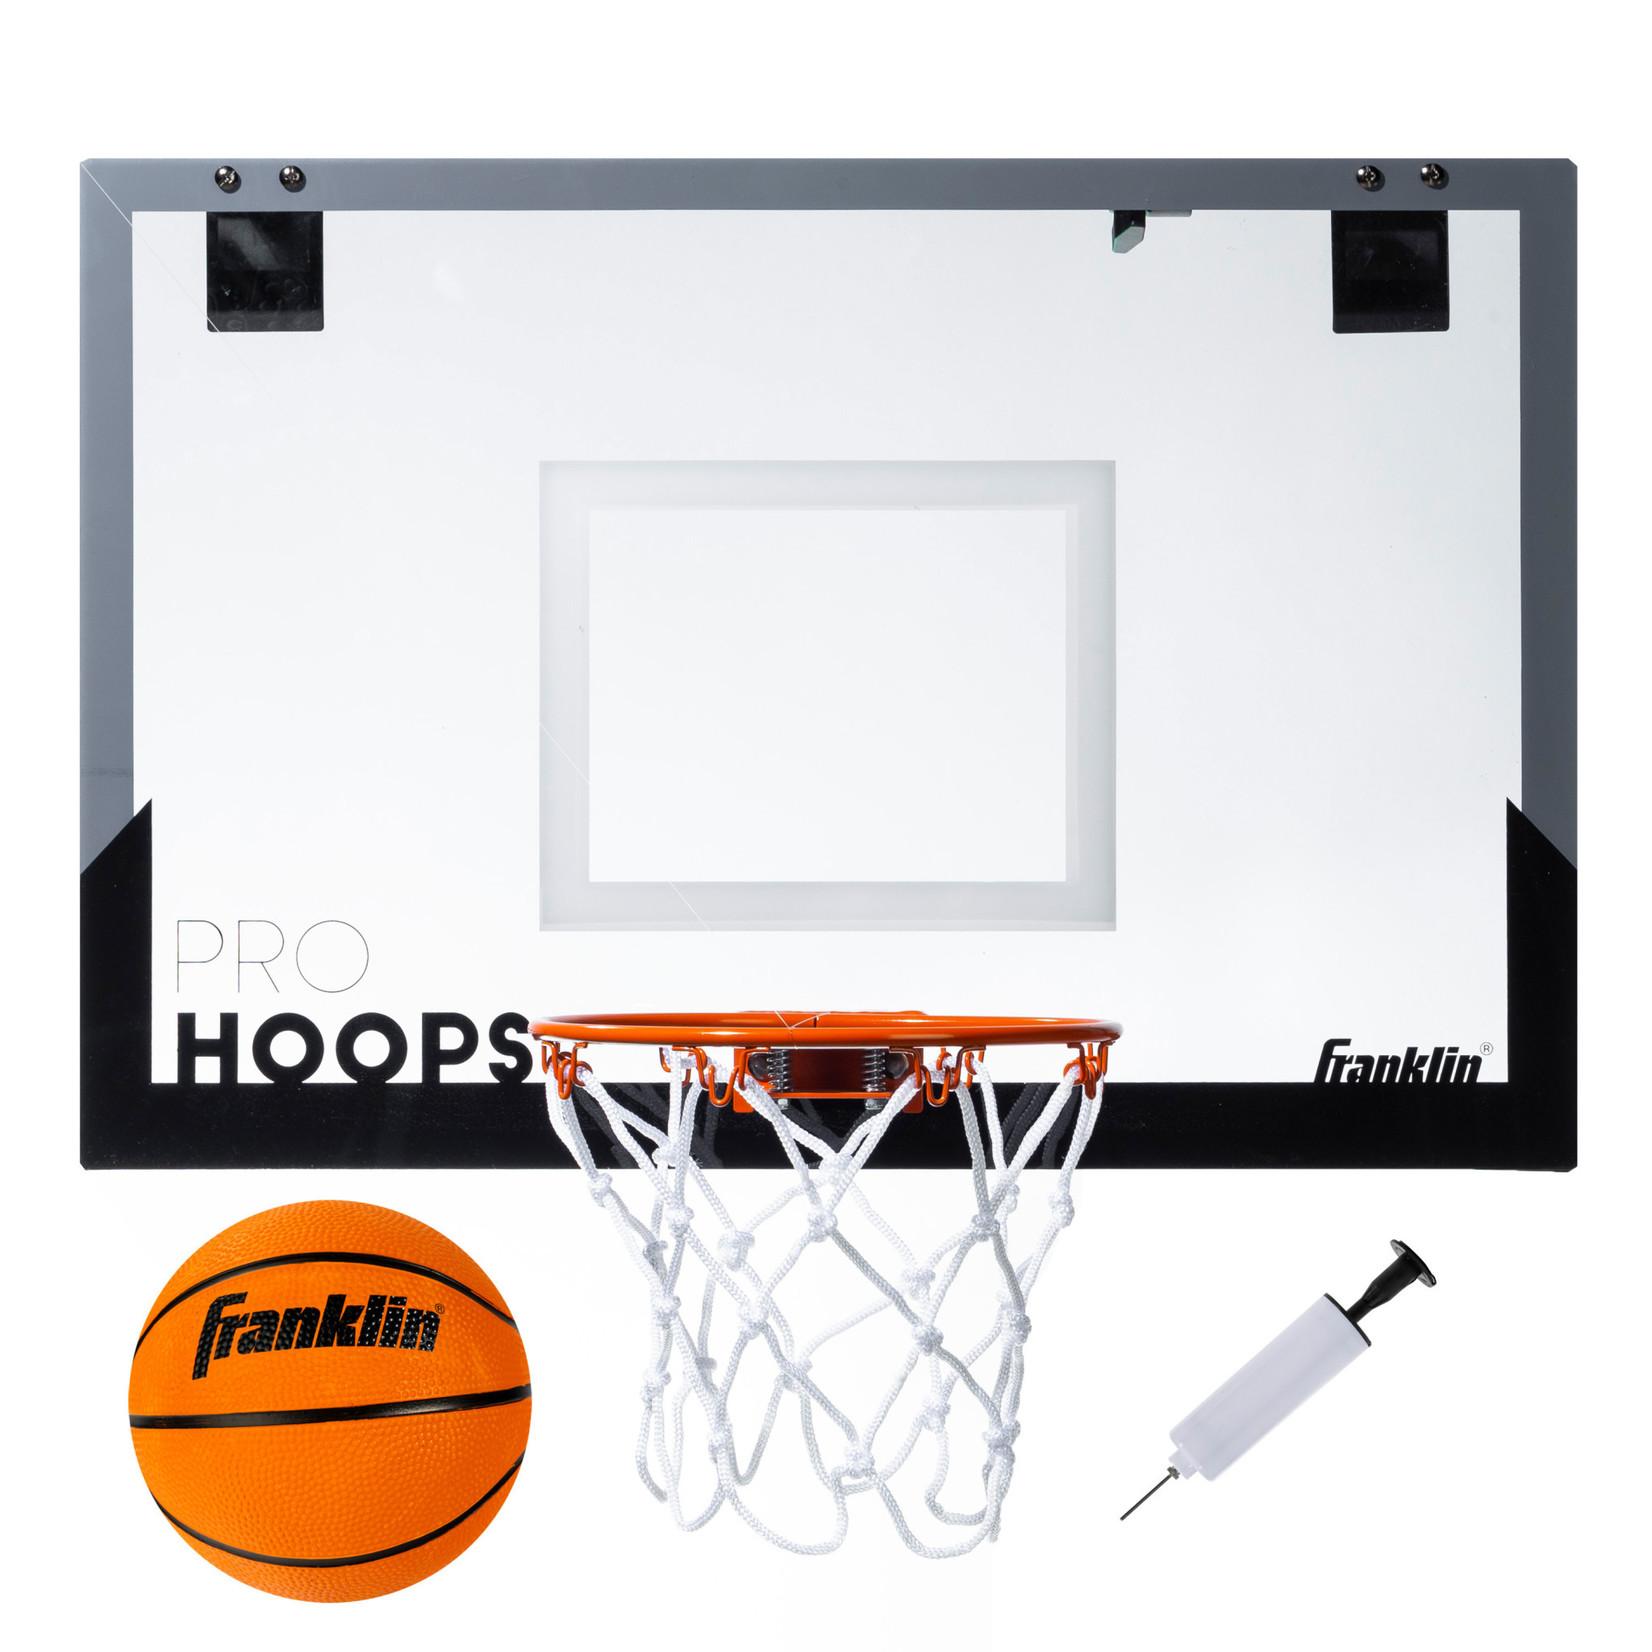 Franklin Franklin Pro Hoops Bk/White XL